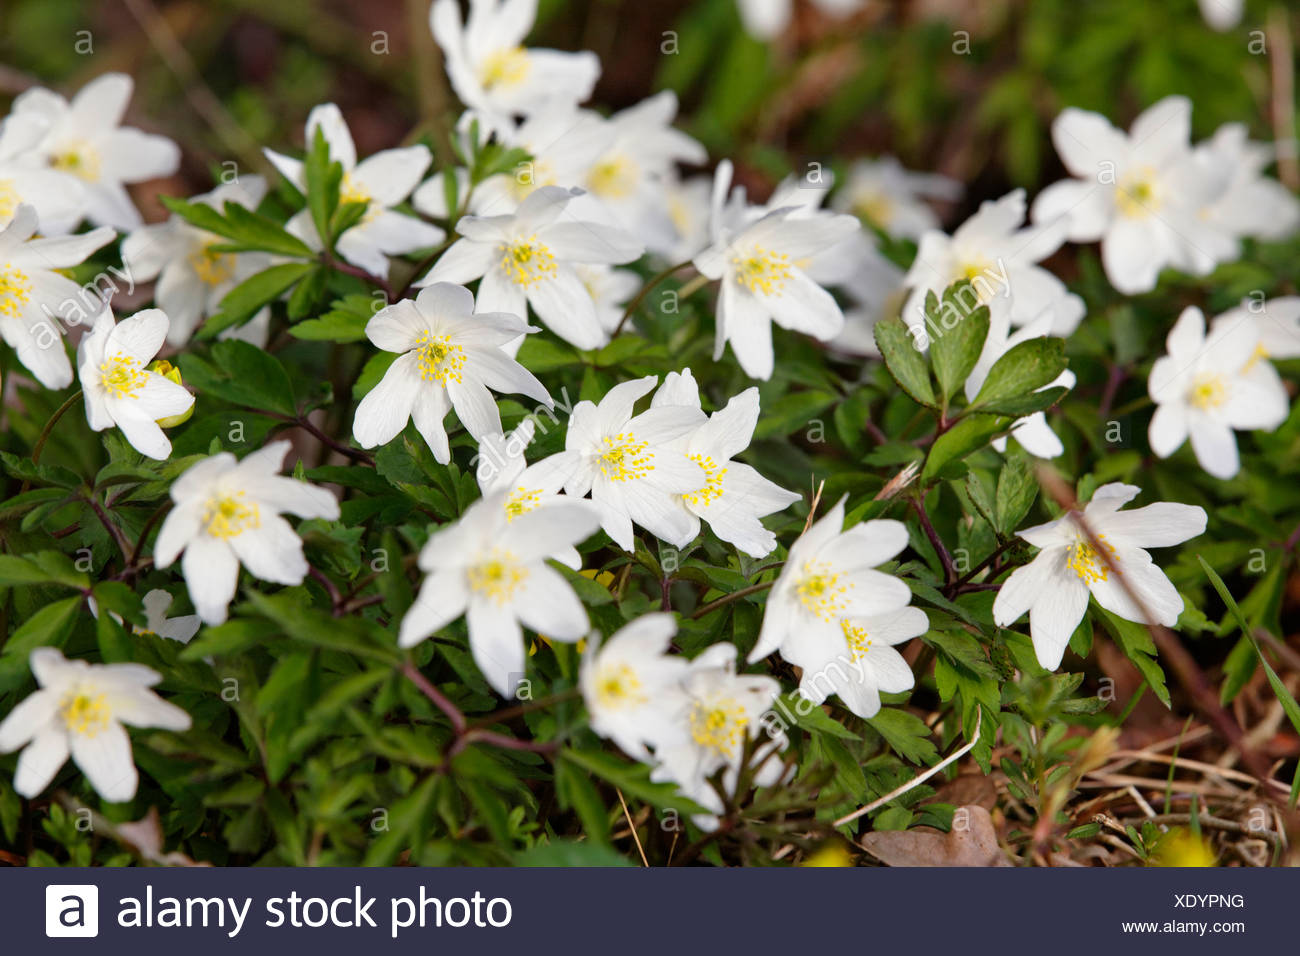 Wood anemone, Windflower, Thimbleweed or Smell fox (Anemone nemorosa), Allier, France, Europe - Stock Image